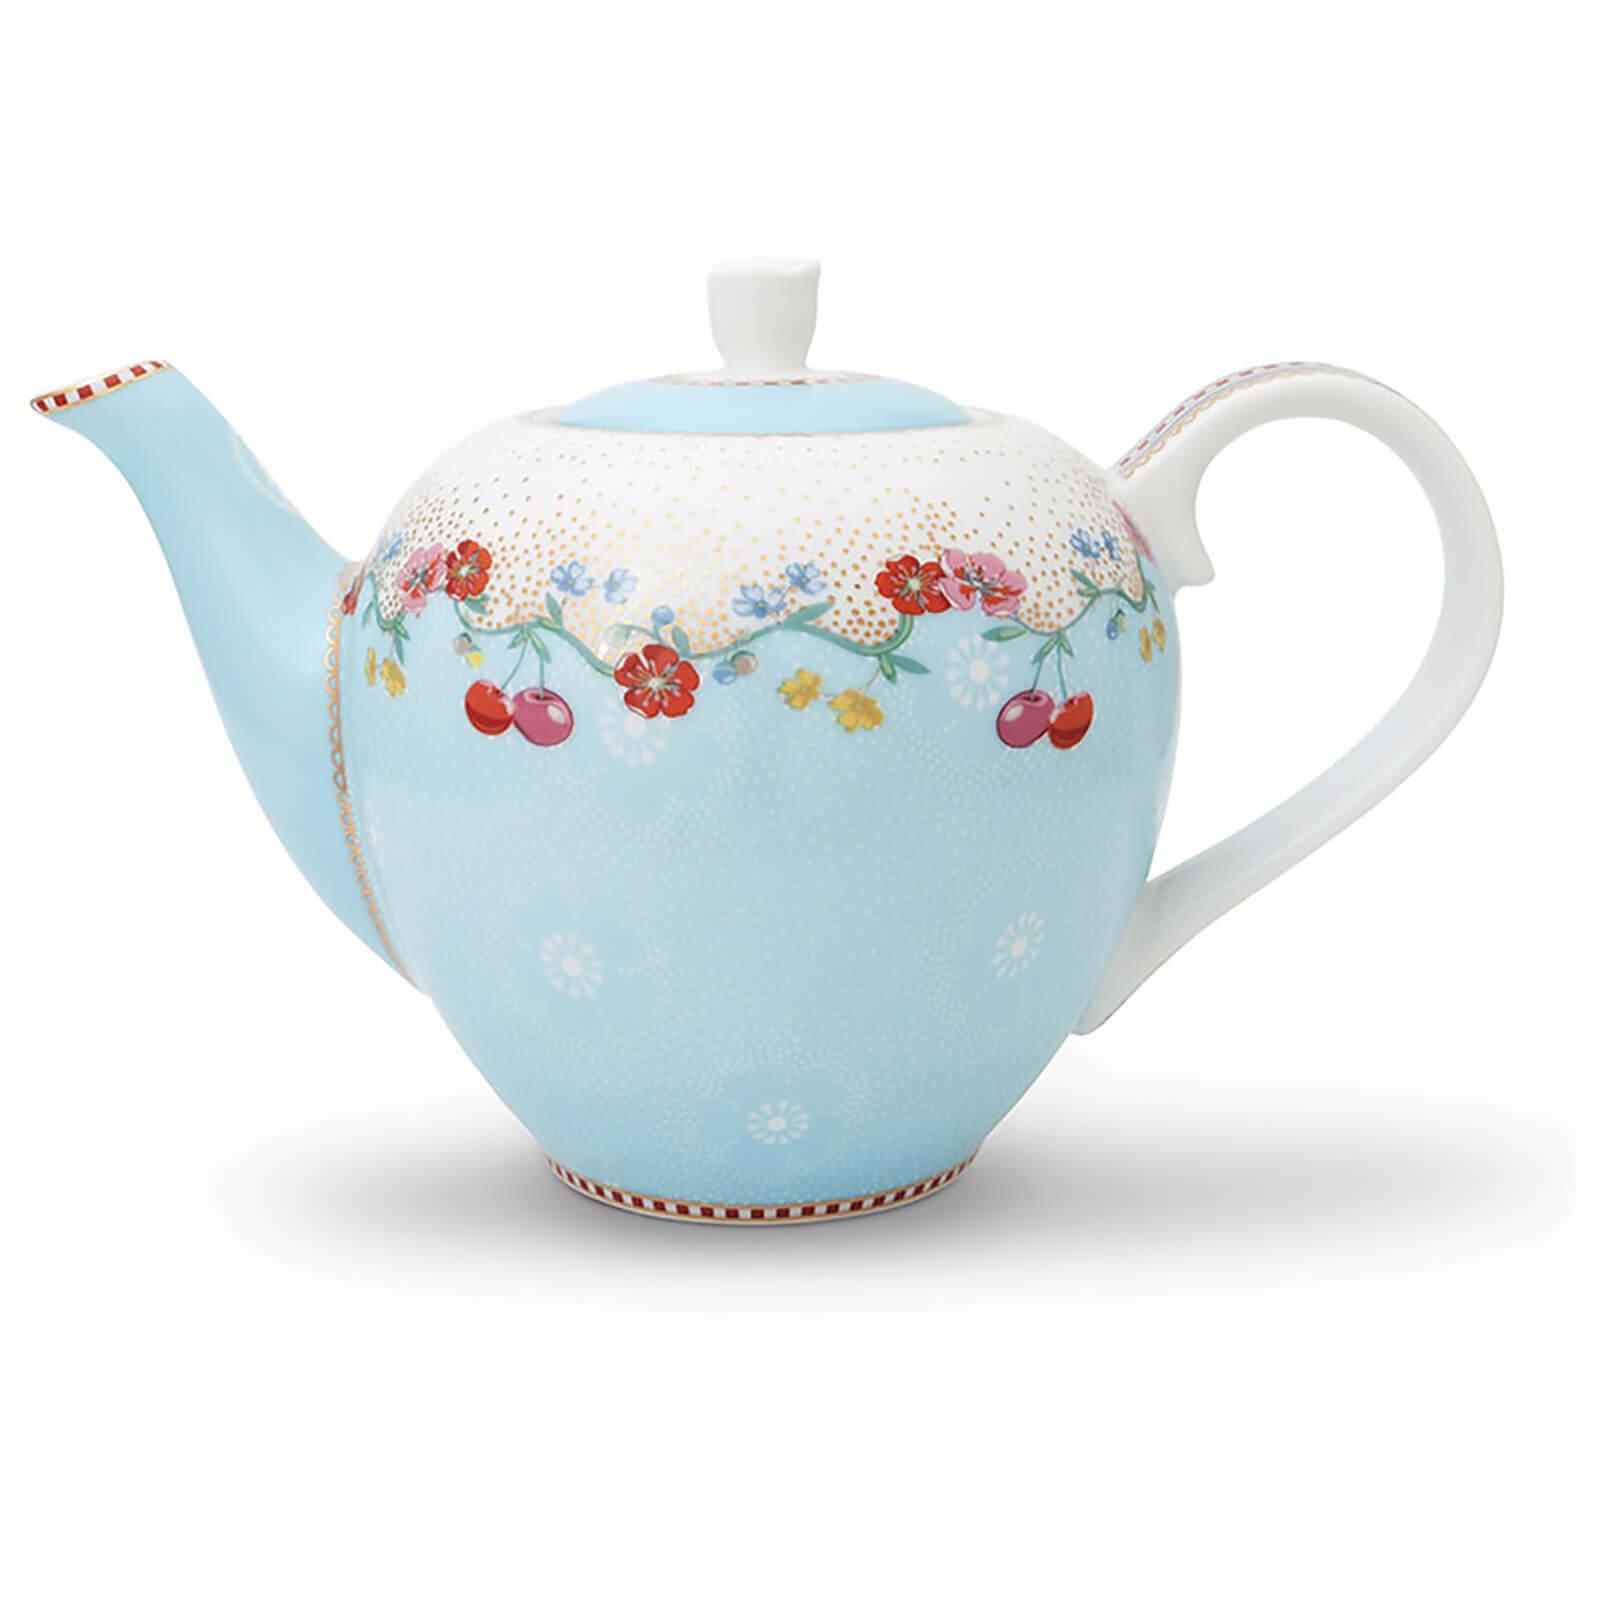 Pip Studio Small Cherry Tea Pot - Blue